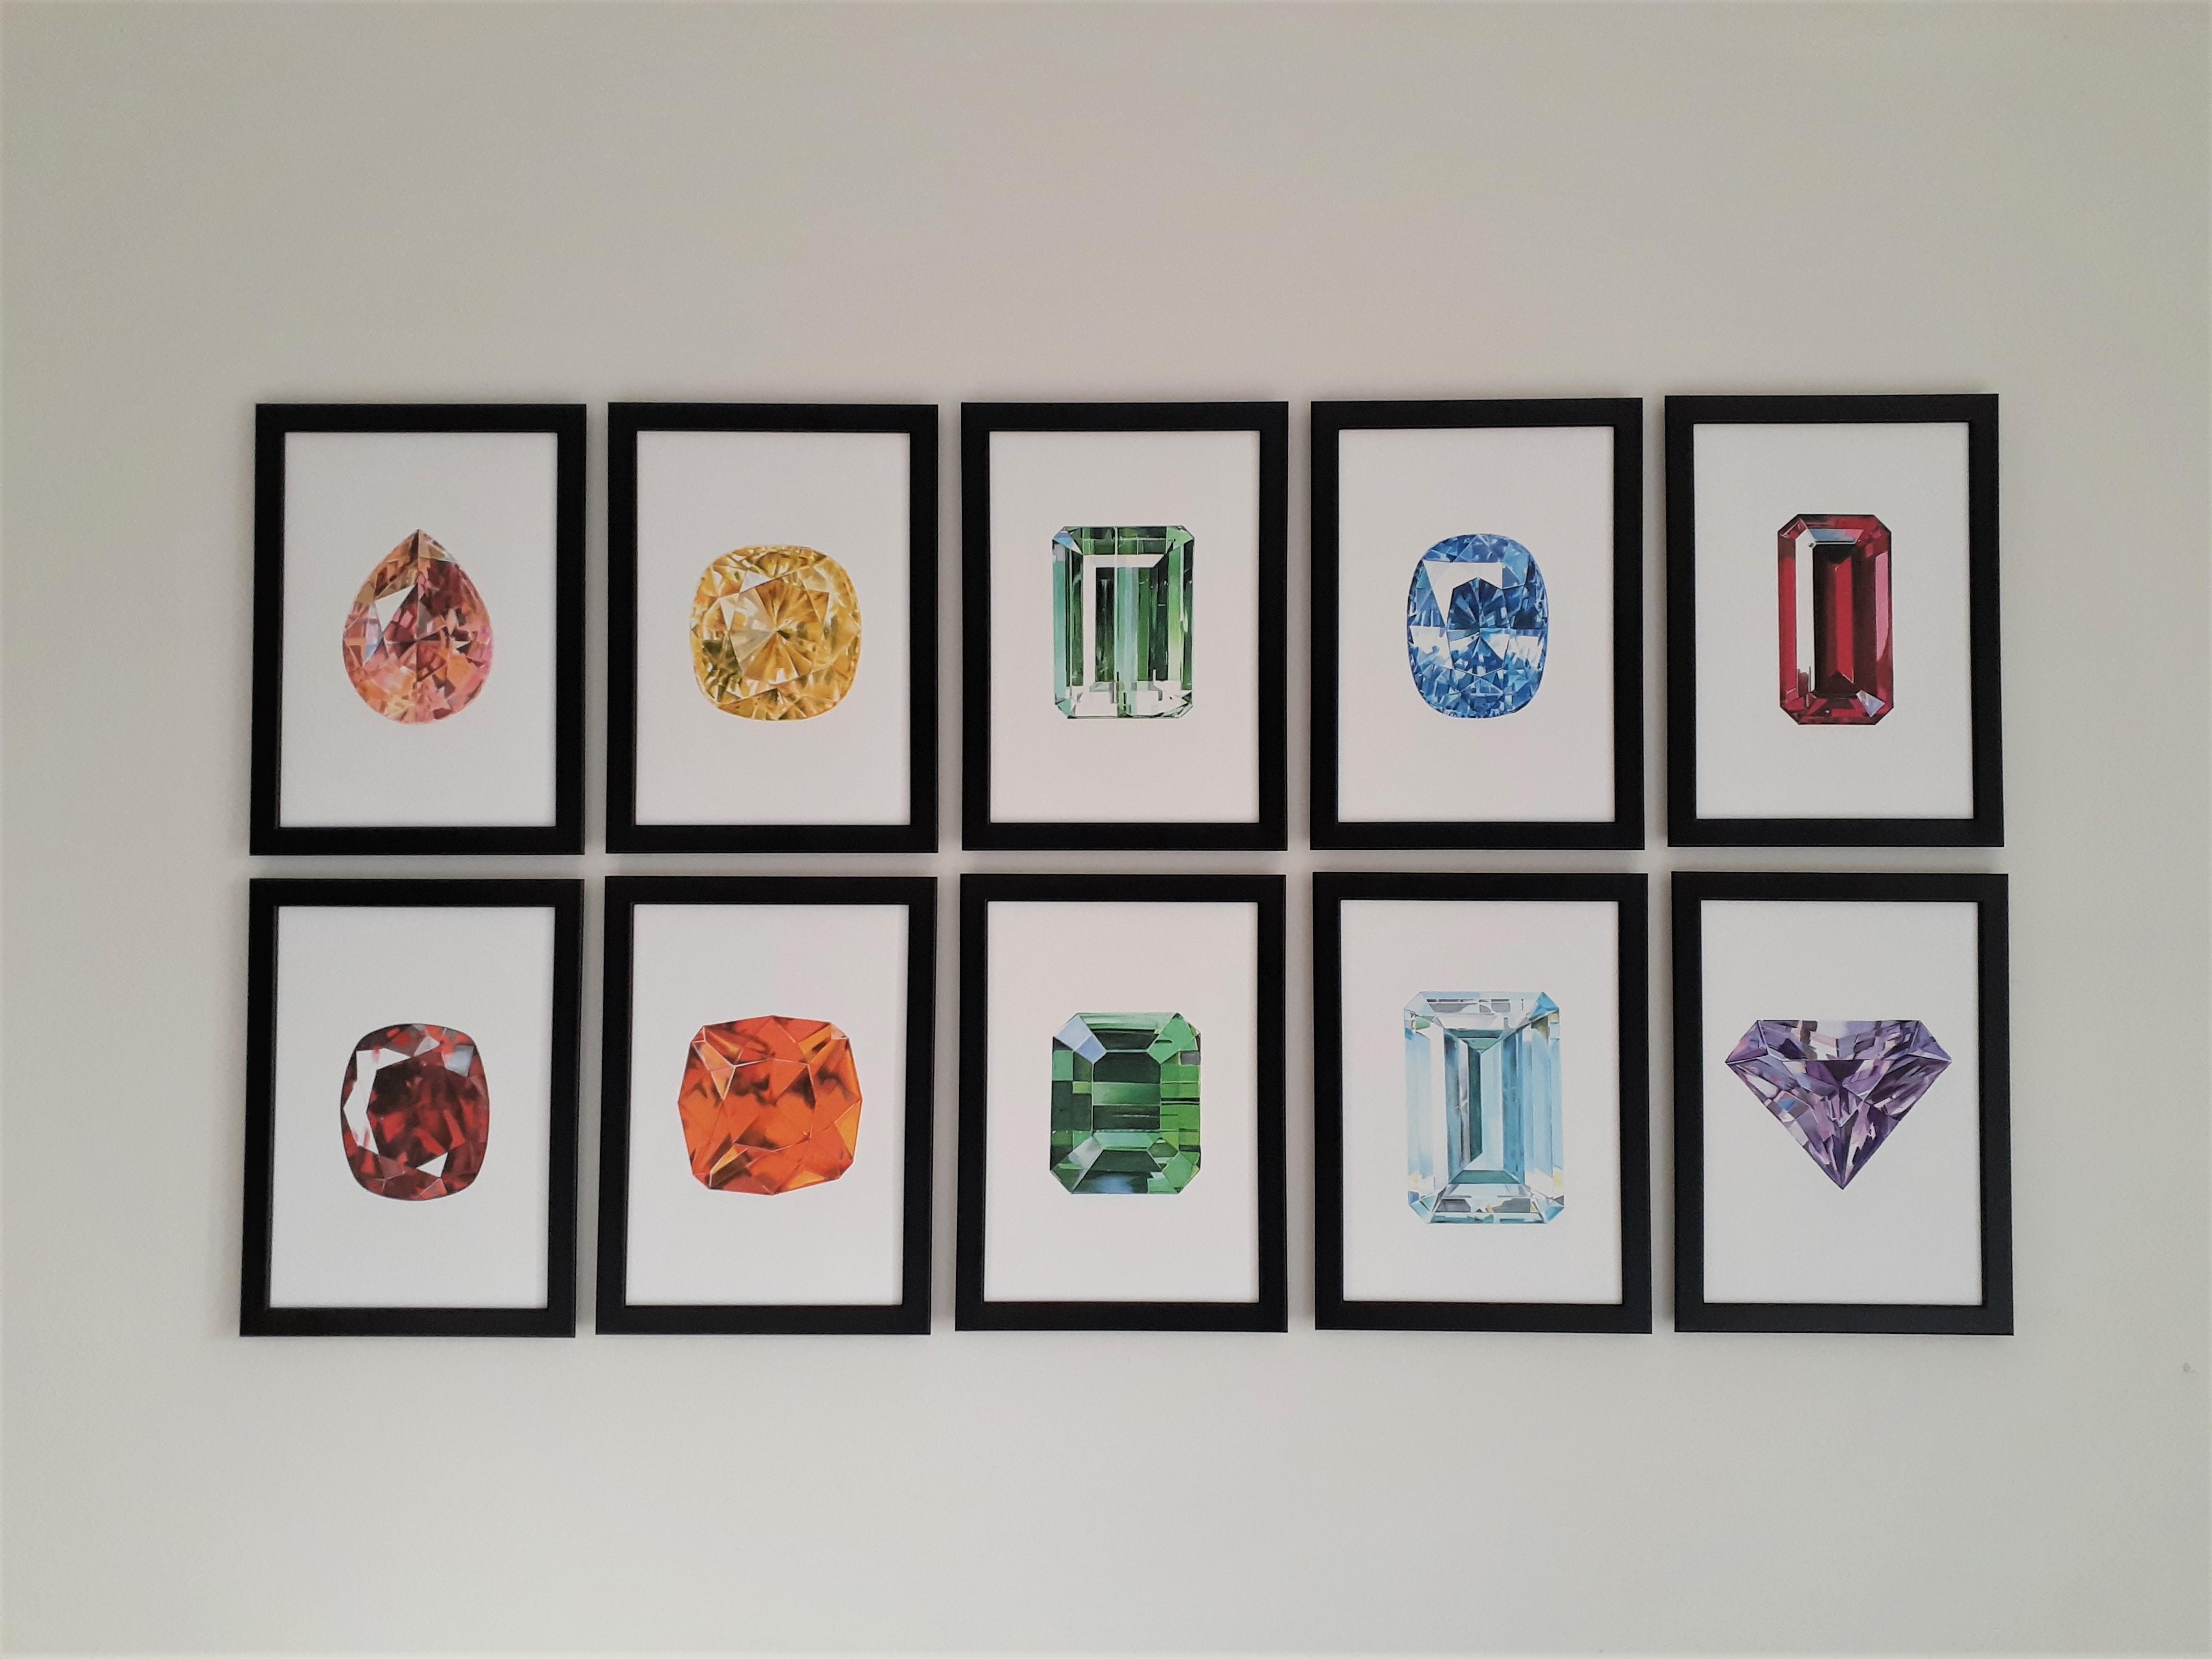 Refinery Row, The Gem Monarchy, Collaboration, Gem, Gems, Gemstones, Jewellery, Jewelry, Wall Prints, Art, Print, Decoration, Furniture